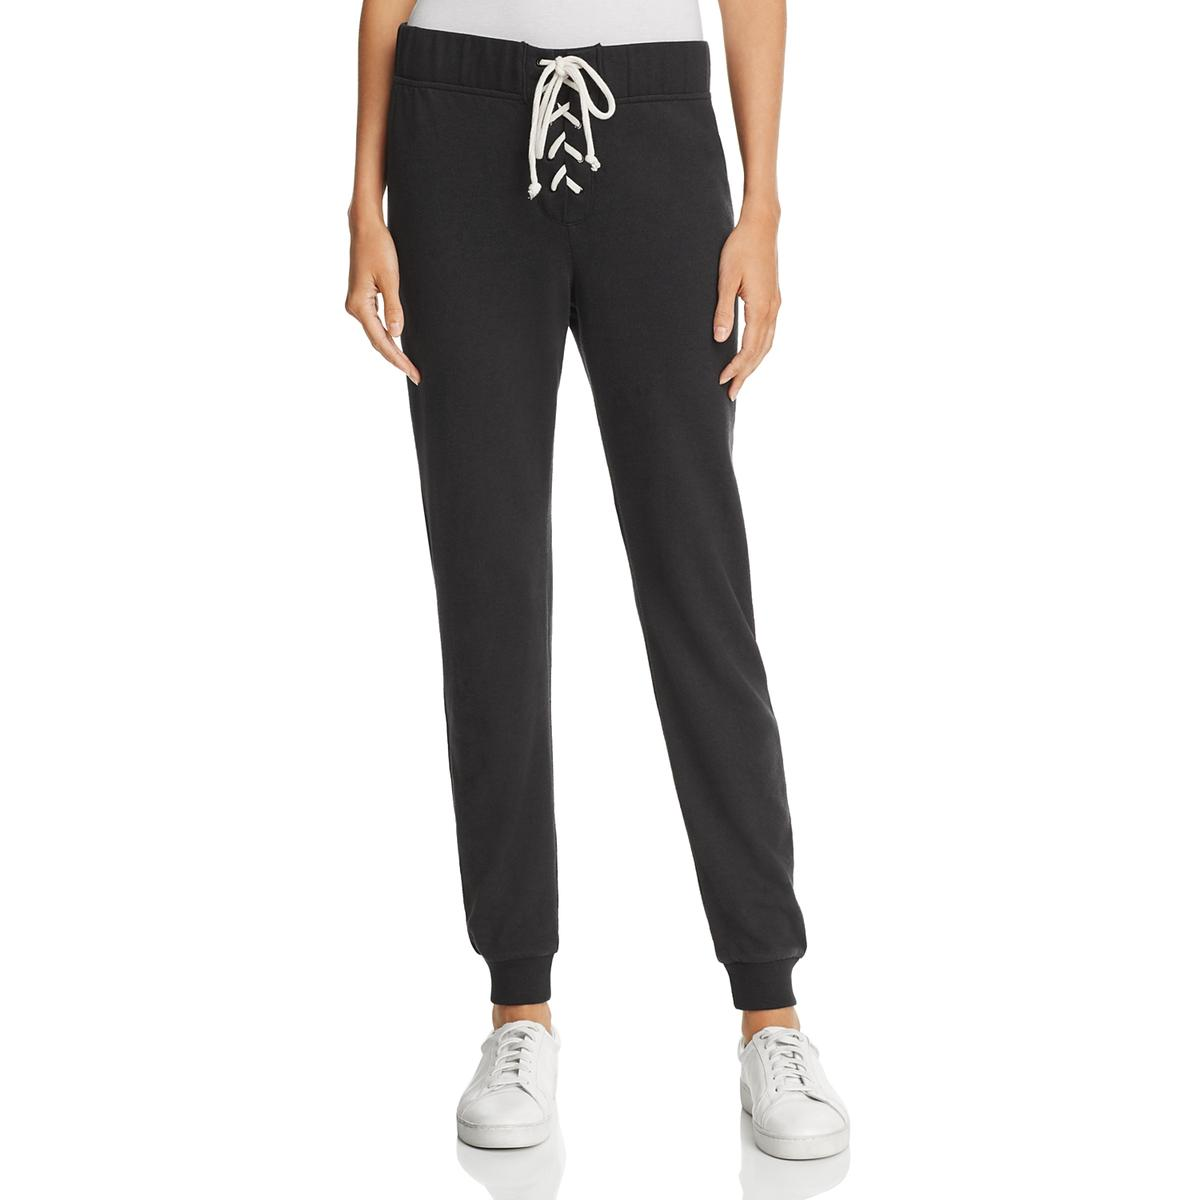 545330fb Alternative Apparel Womens Black Lace-Up Casual Jogger Sweatpants S ...